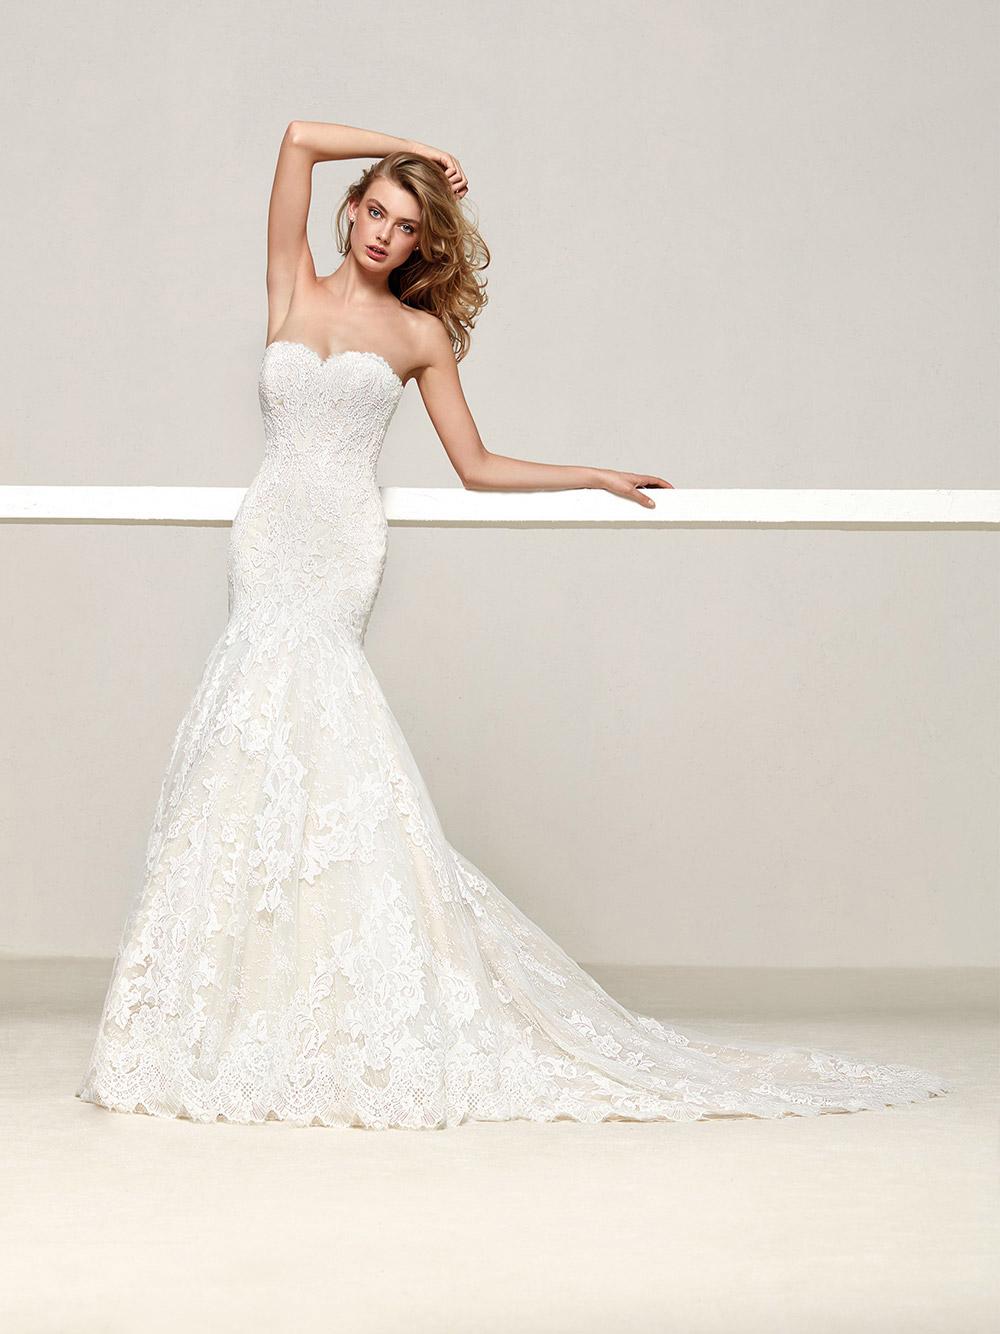 Druida - Pronovias 2018 Bridal Collection. www.theweddingnotebook.com